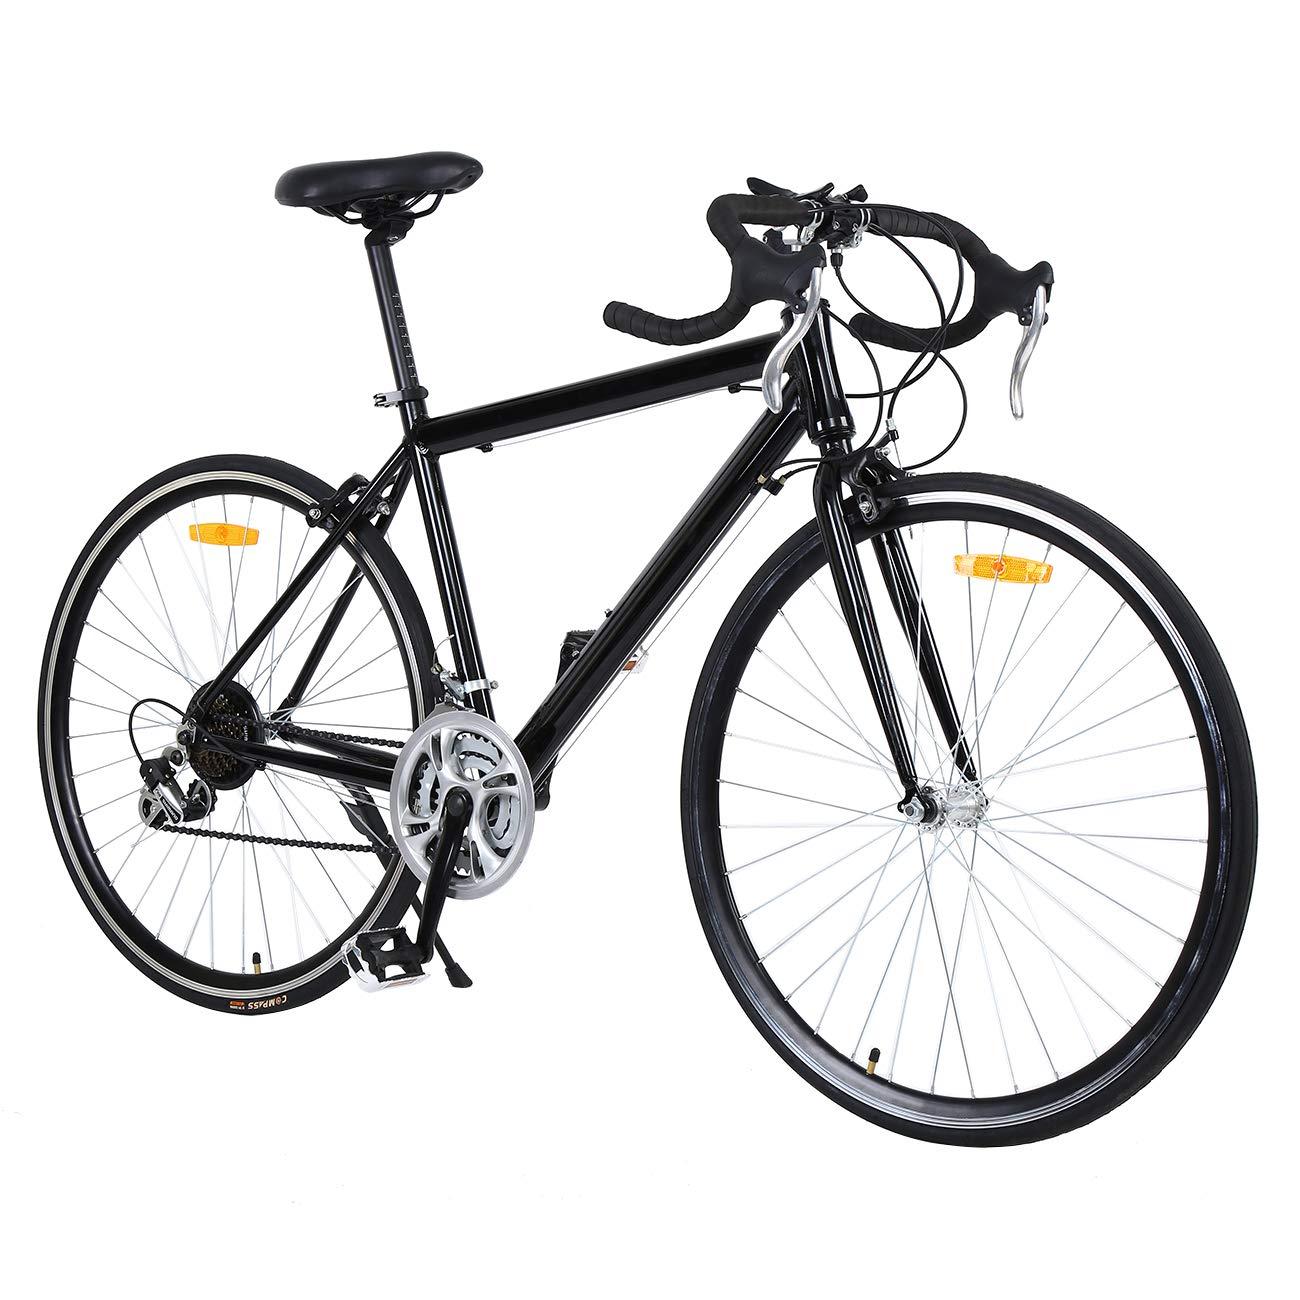 Black MuGuang 26 Inches Aluminum Bike Racing Bike 21 Speed Bicycle 700c